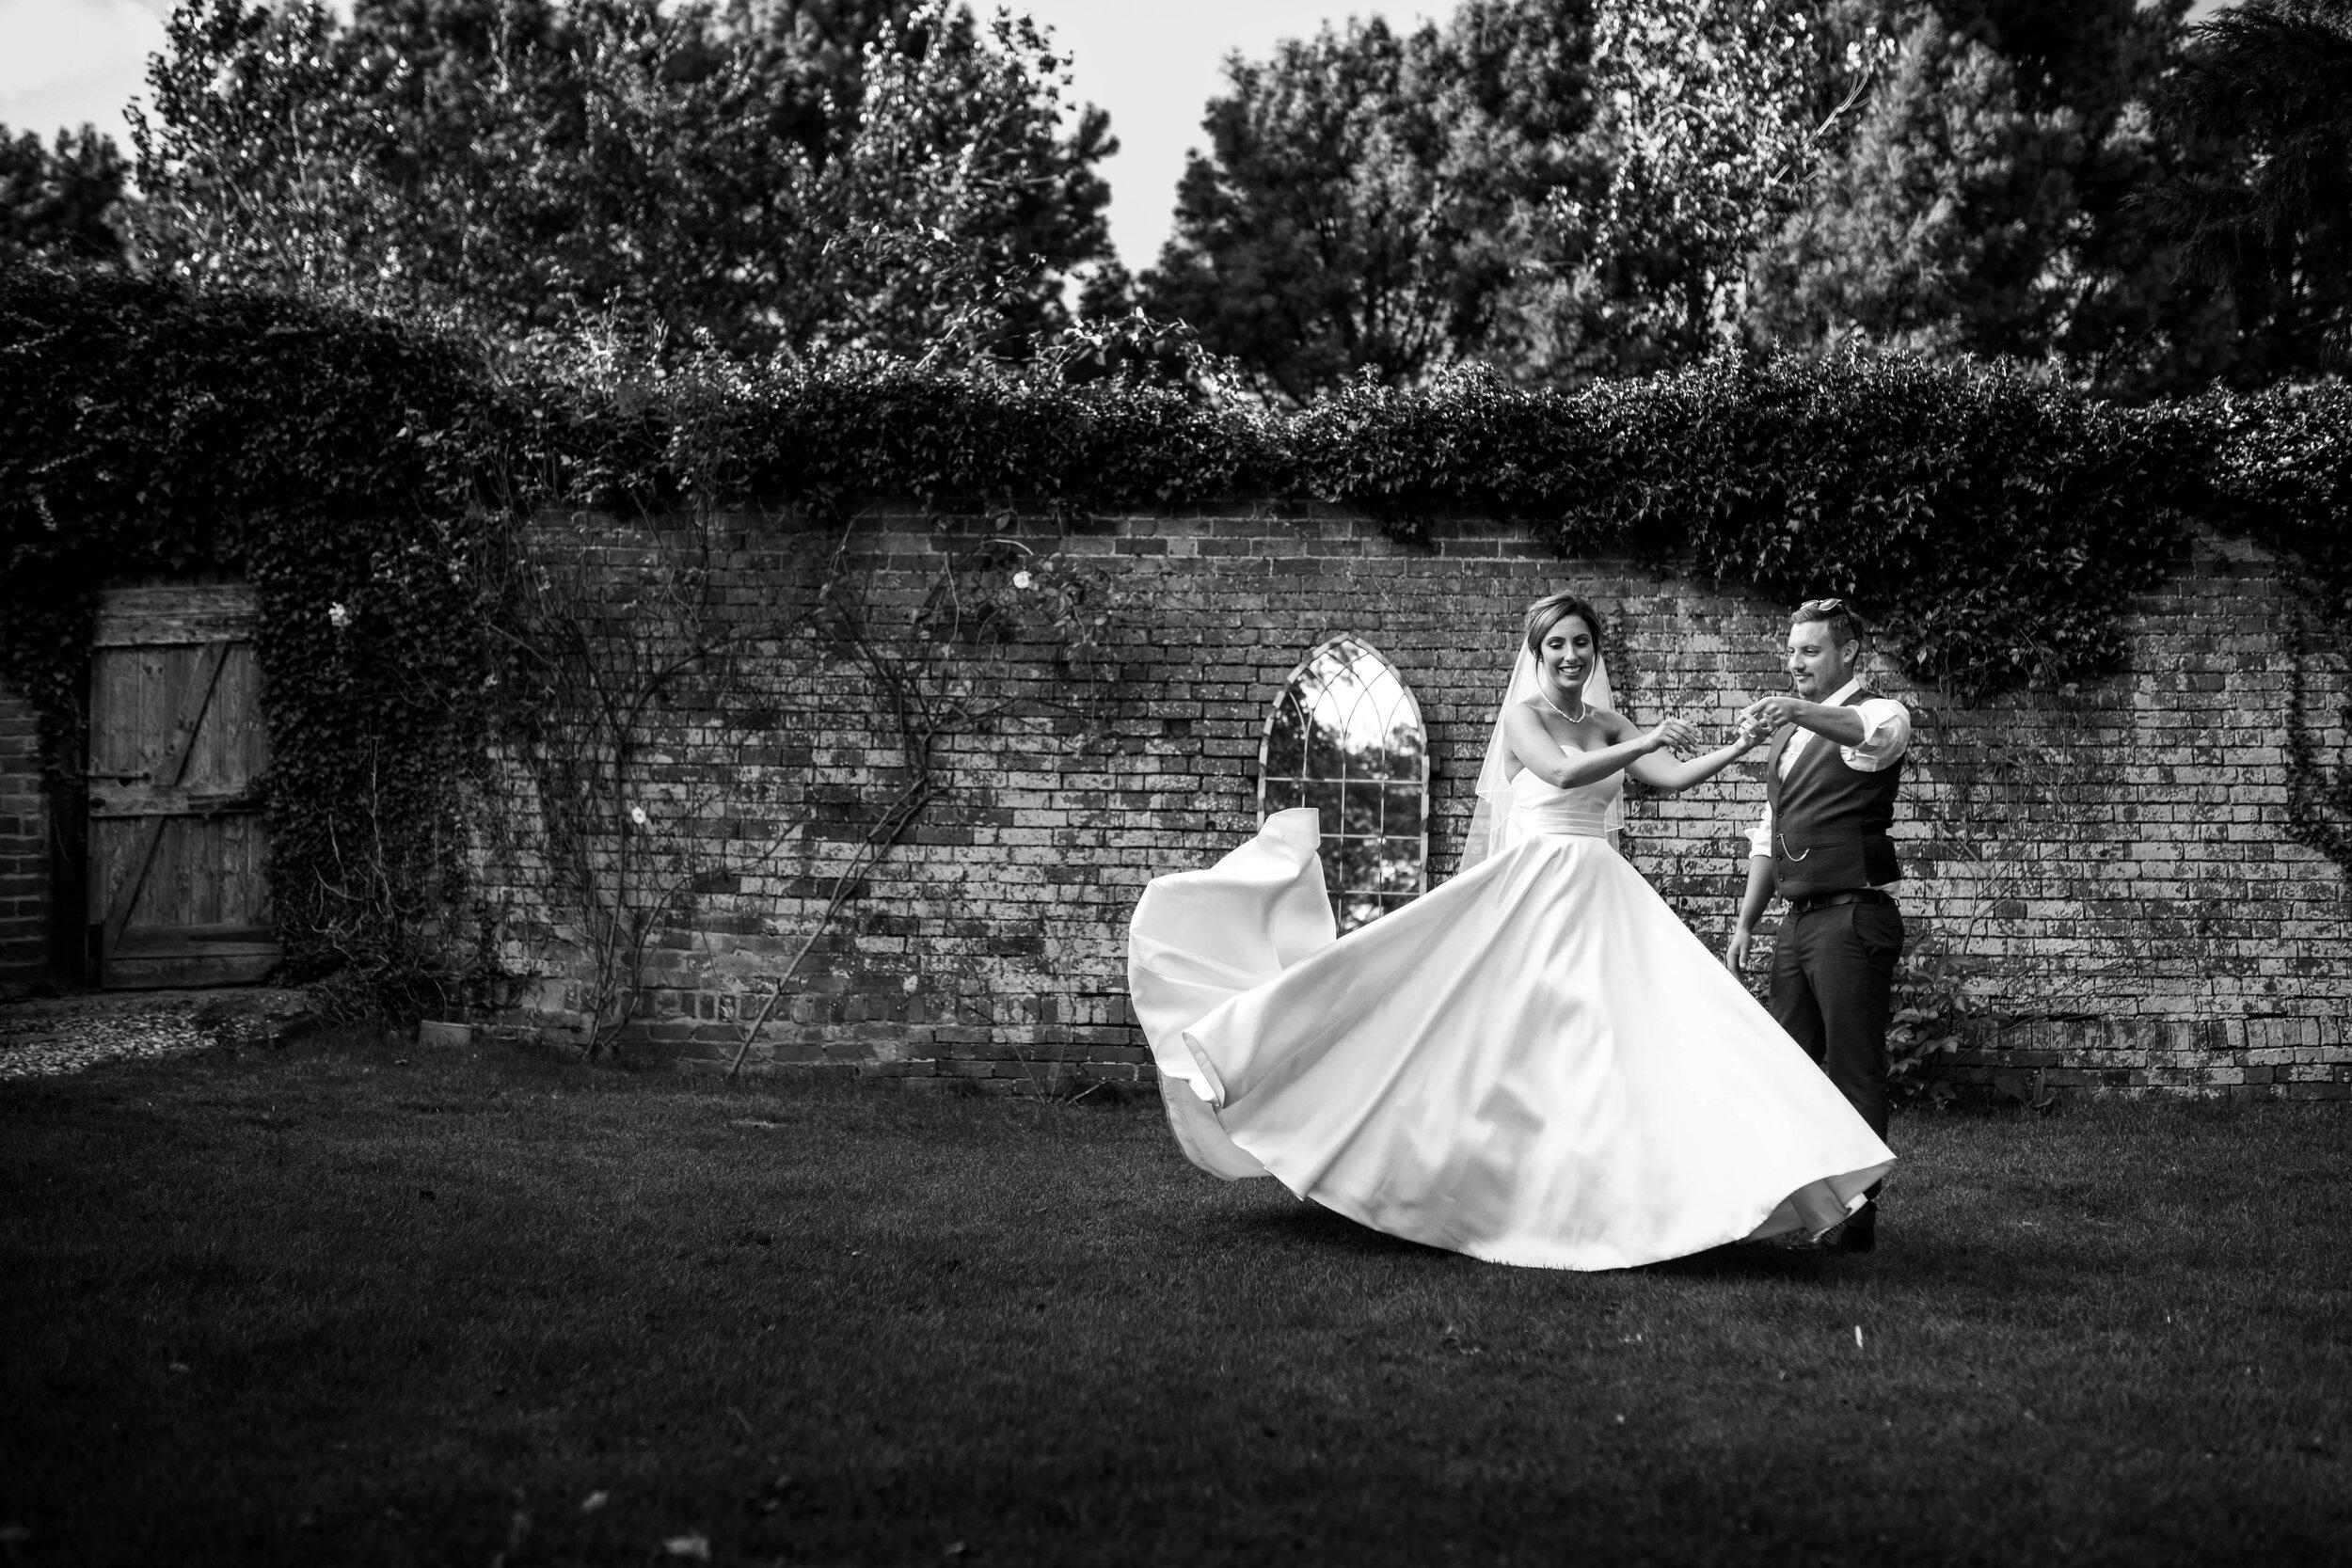 Dodmoor_House_Nick_Labrum_Photo_Steph&Dan-549.jpg